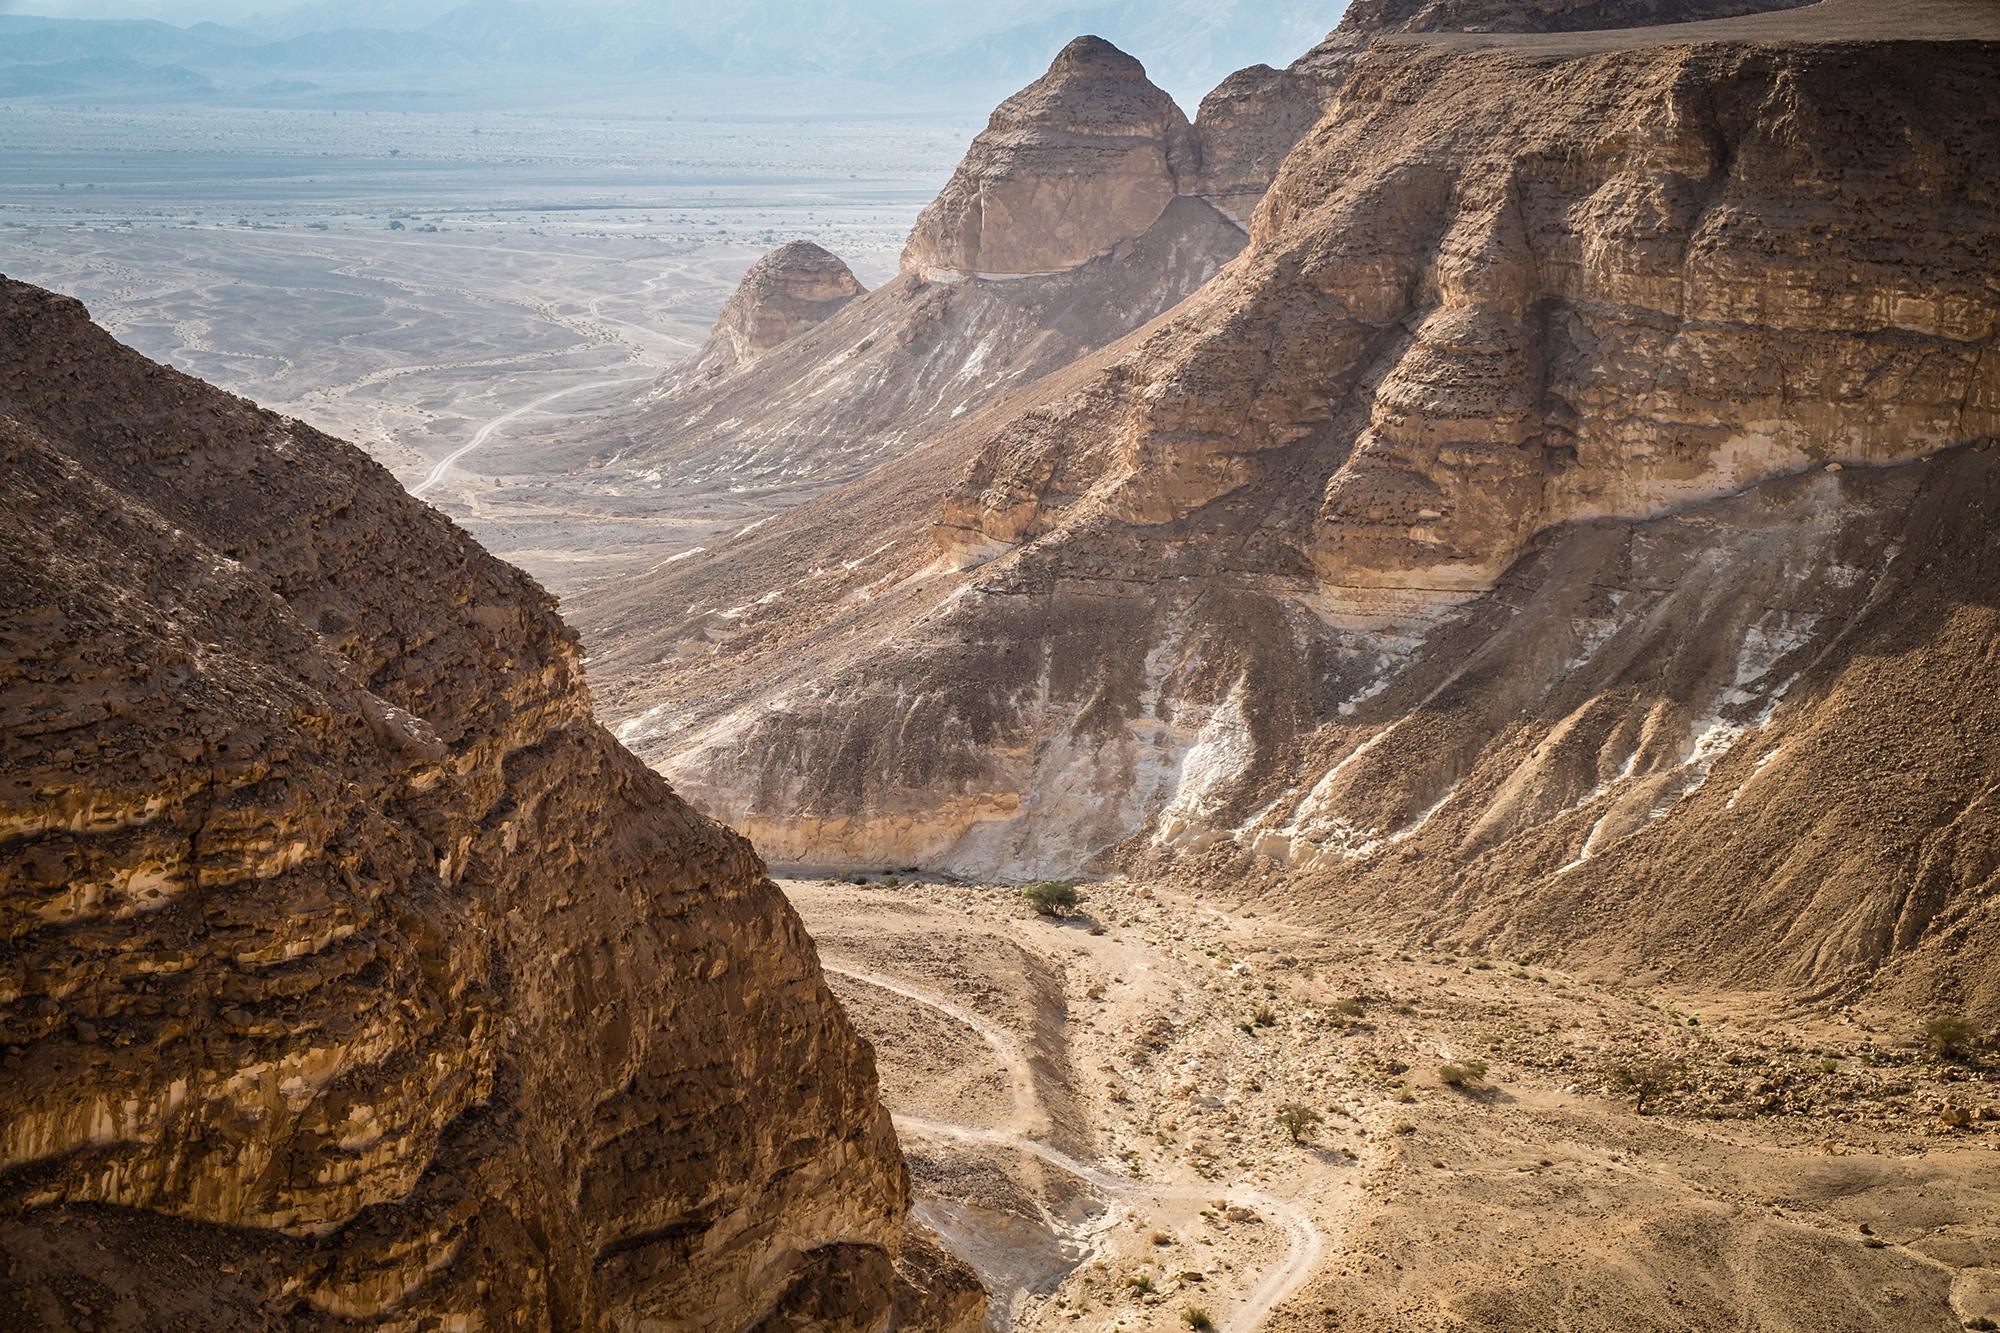 Vardit Canyon in der Negev- Wüste